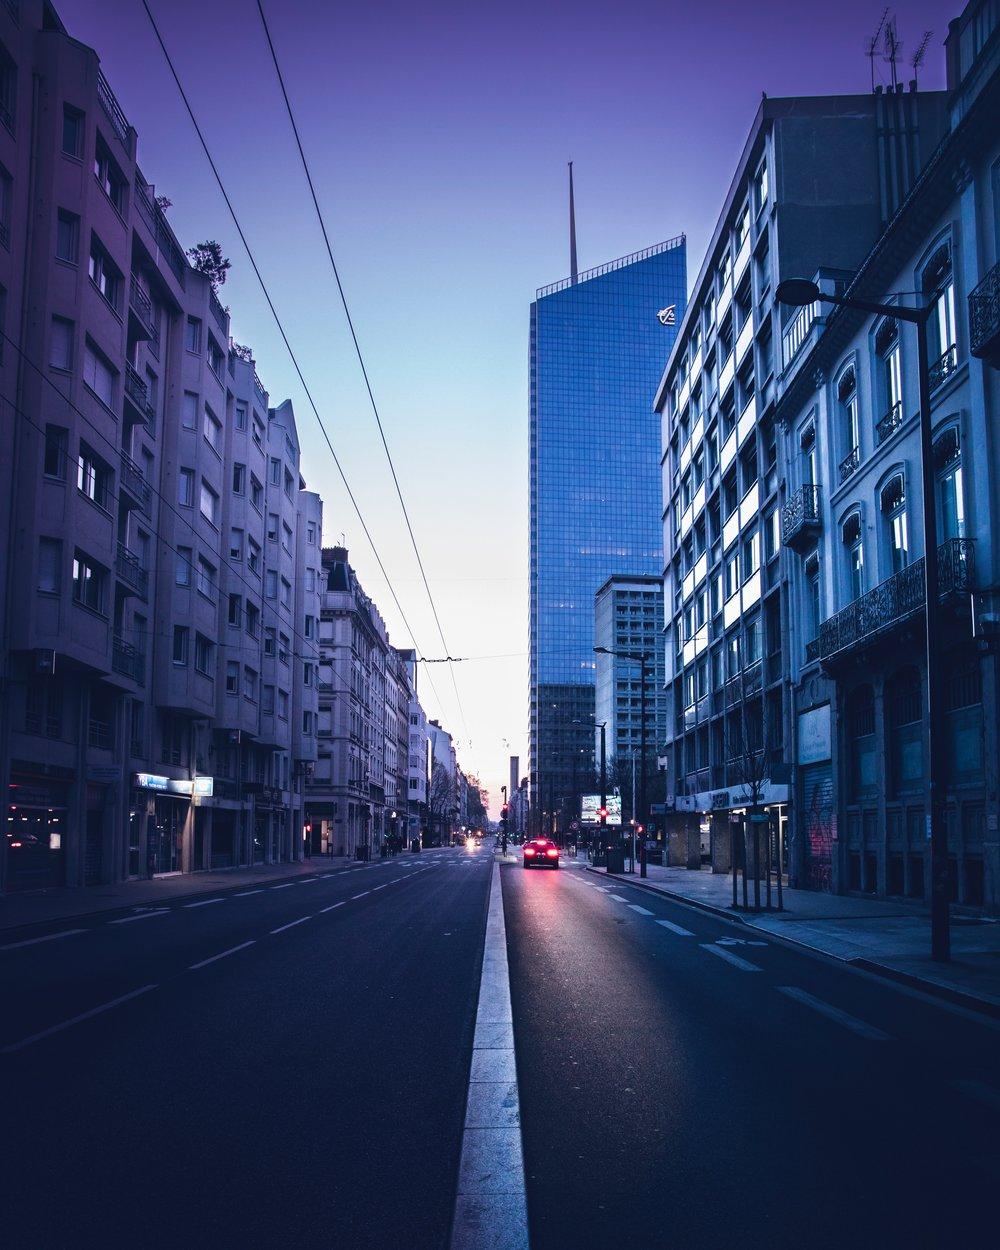 architecture-asphalt-buildings-2081196.jpg